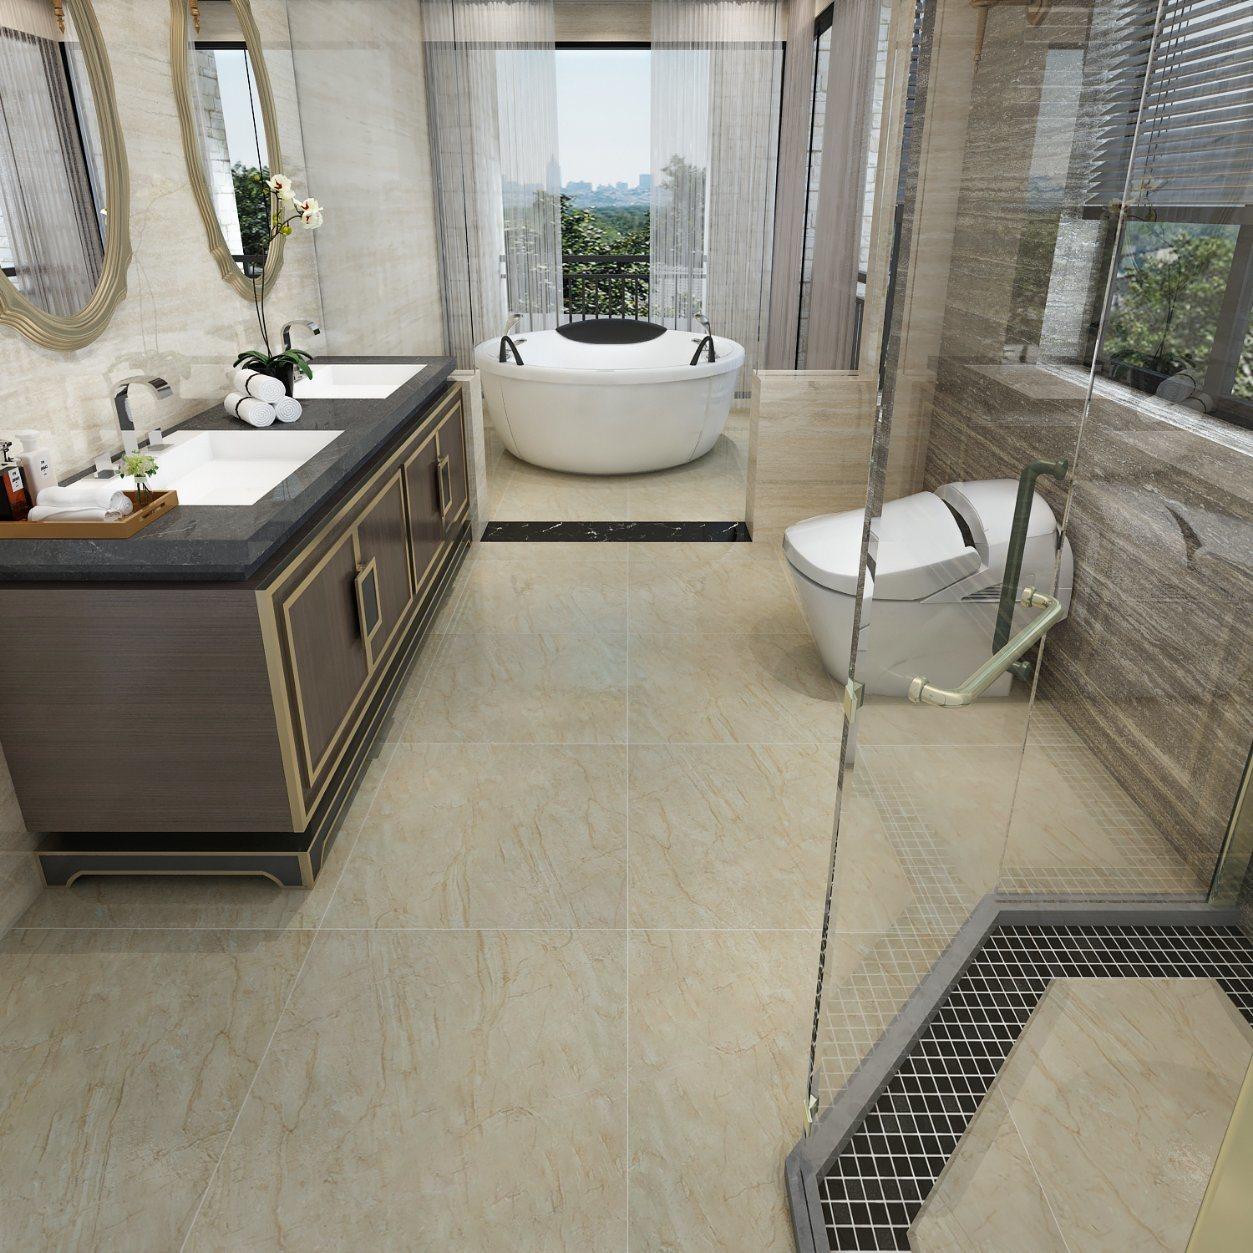 Bathroom Floor China Porcelain Tile, Is Glazed Ceramic Tile Good For Bathroom Floor